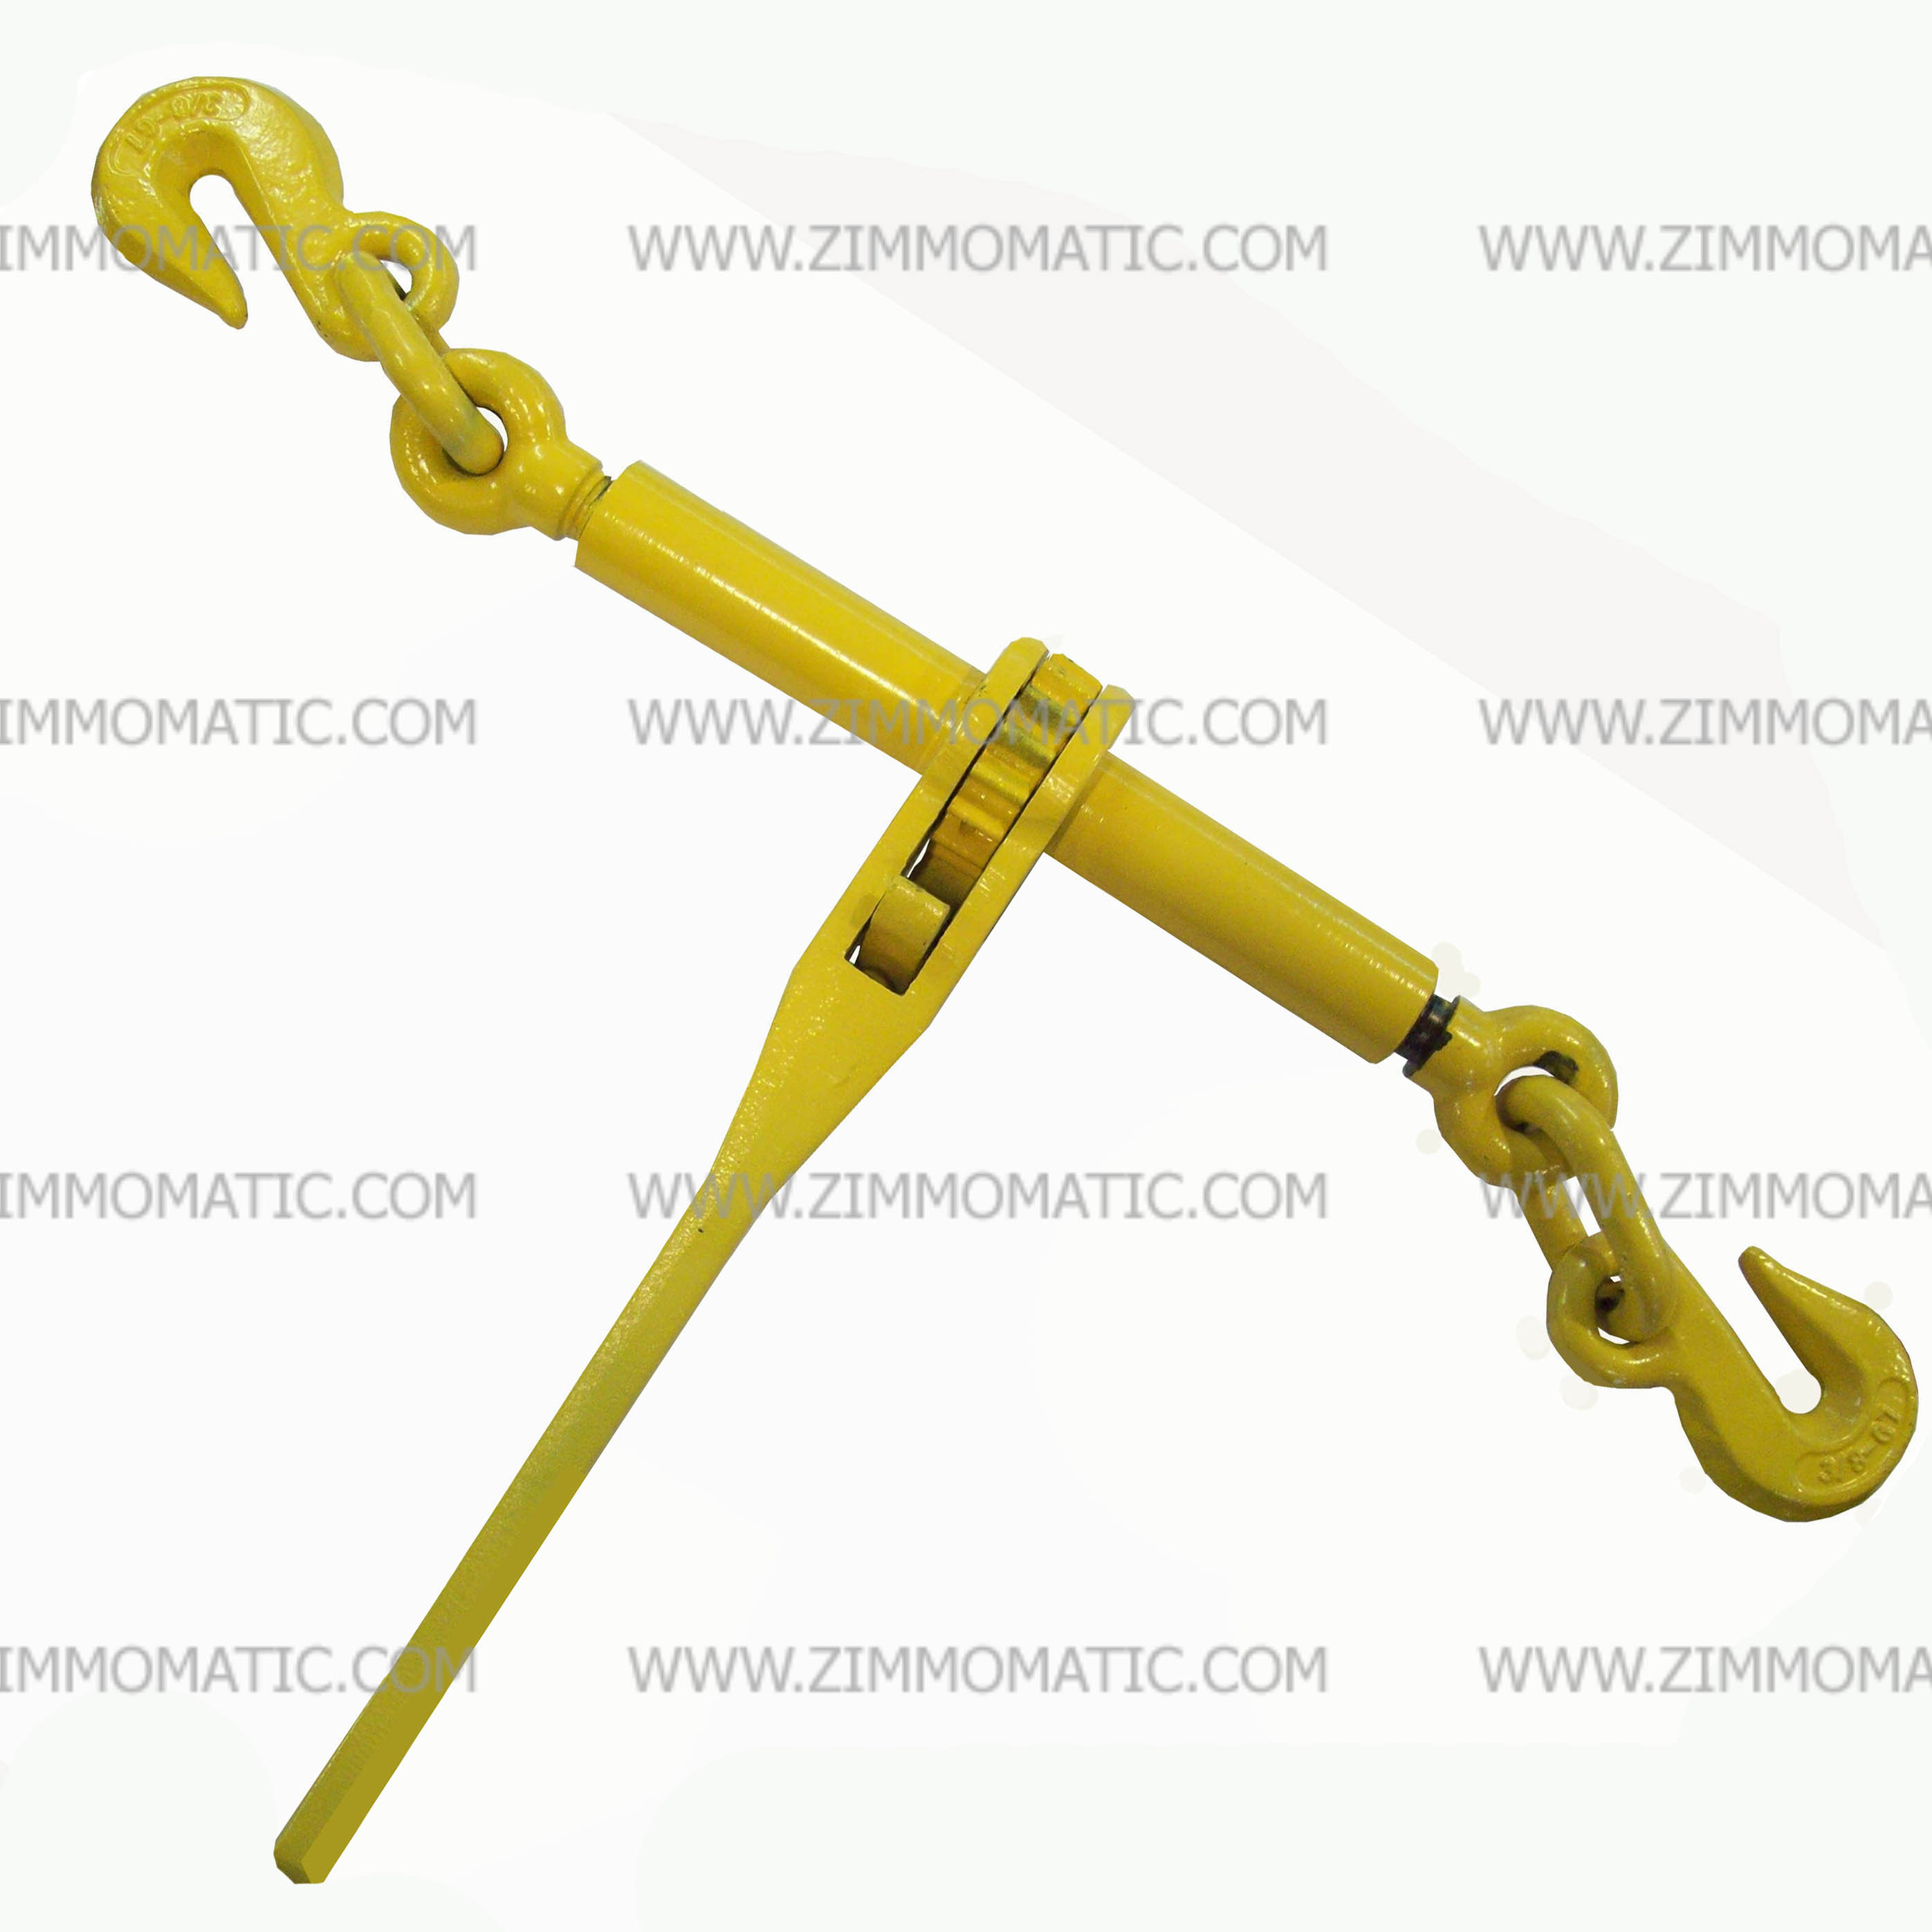 ratchet binder, 5/16 inch - 3/8 inch, import